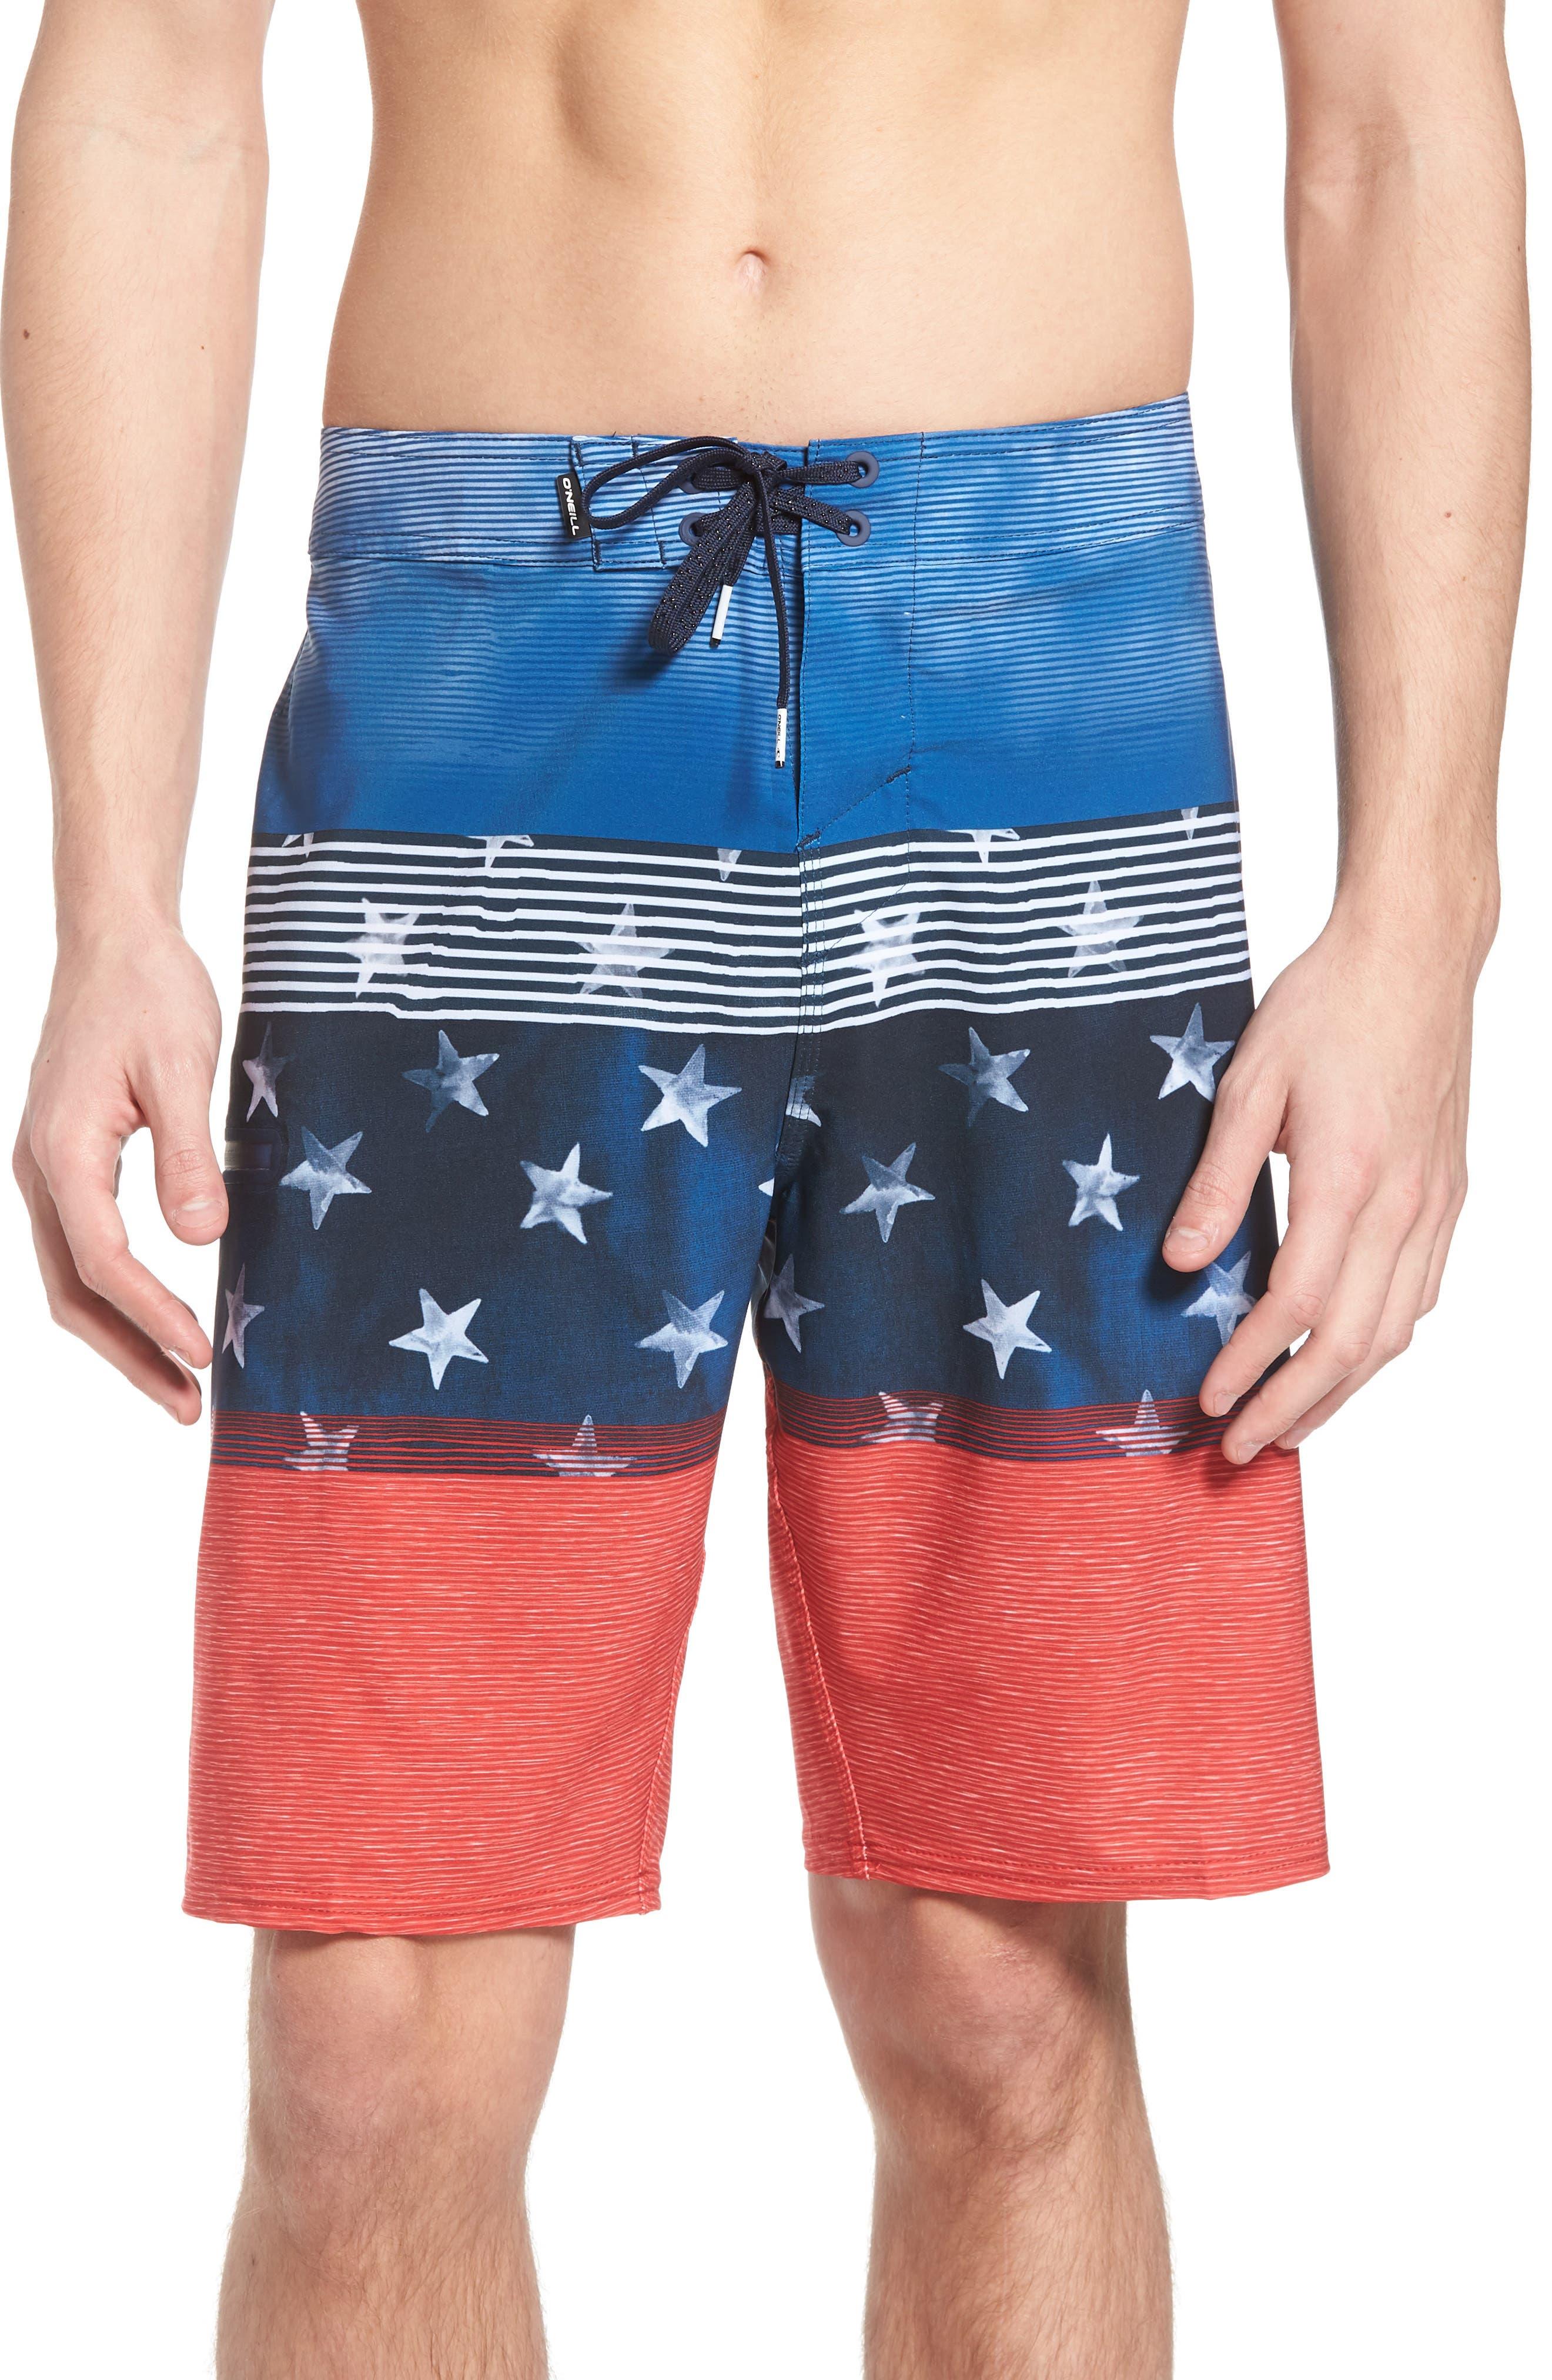 Hyperfreak Board Shorts,                             Main thumbnail 1, color,                             RED WHITE BLUE